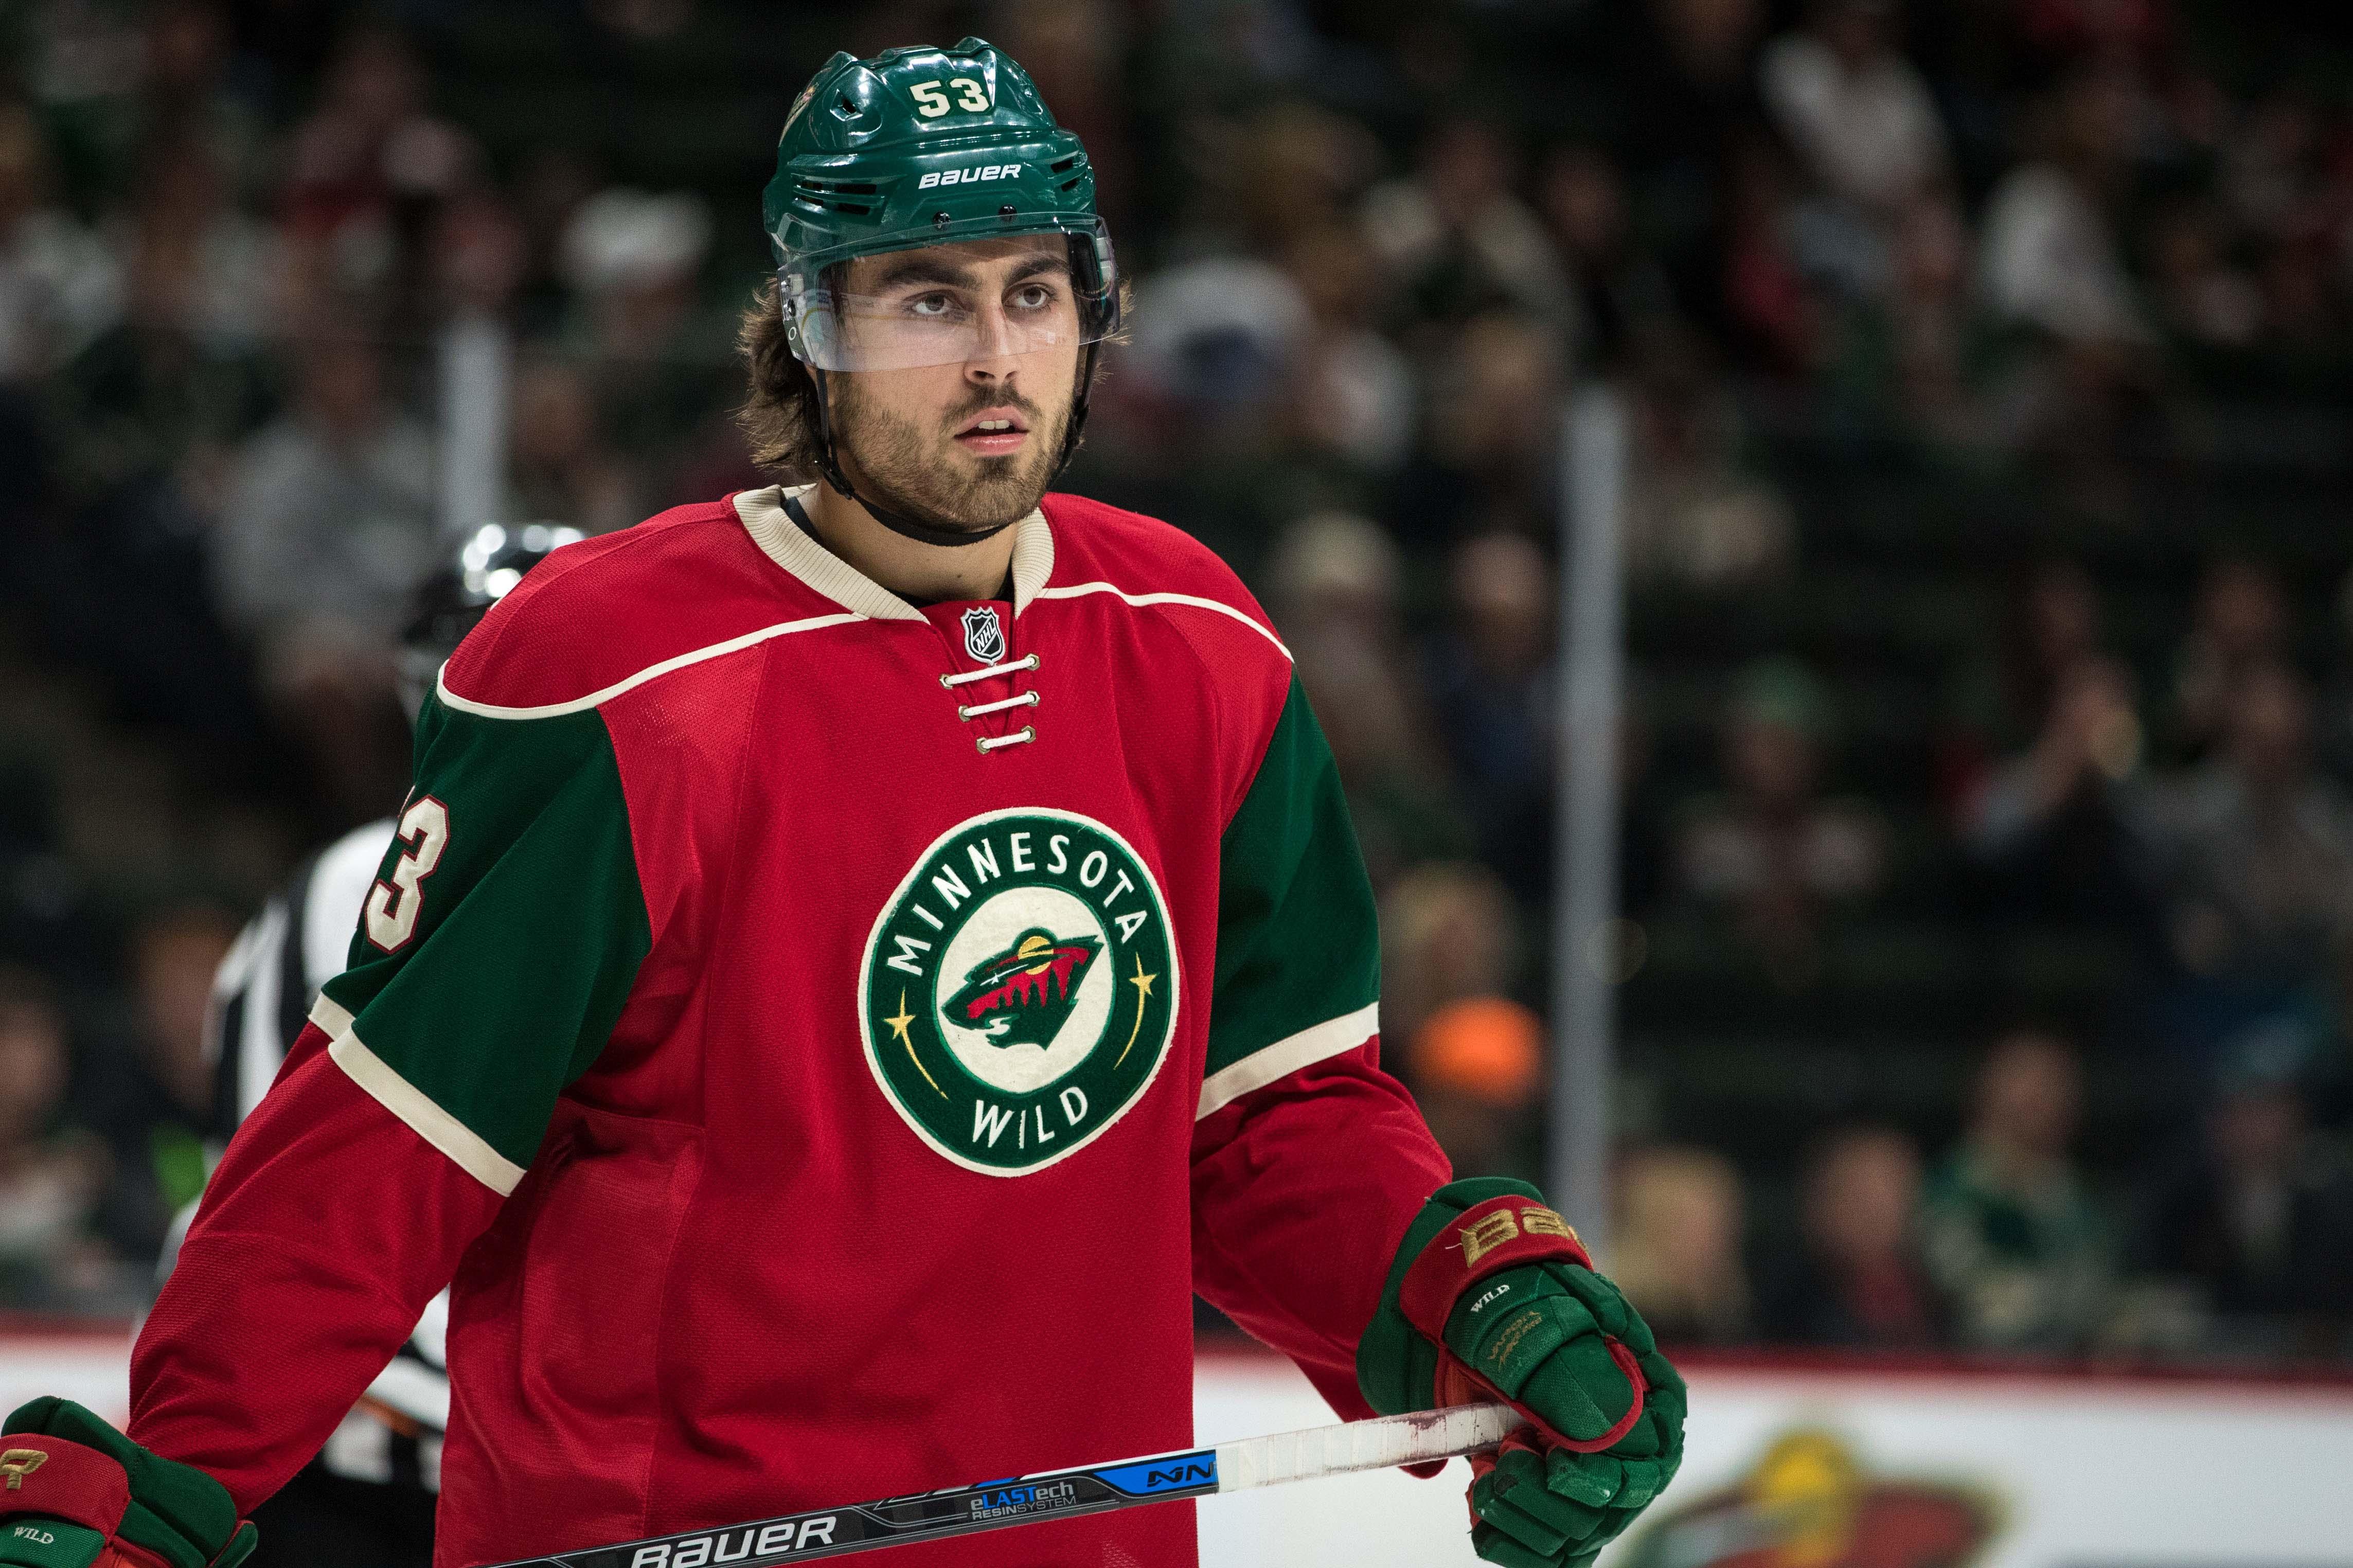 NHL: Preseason-Colorado Avalanche at Minnesota Wild